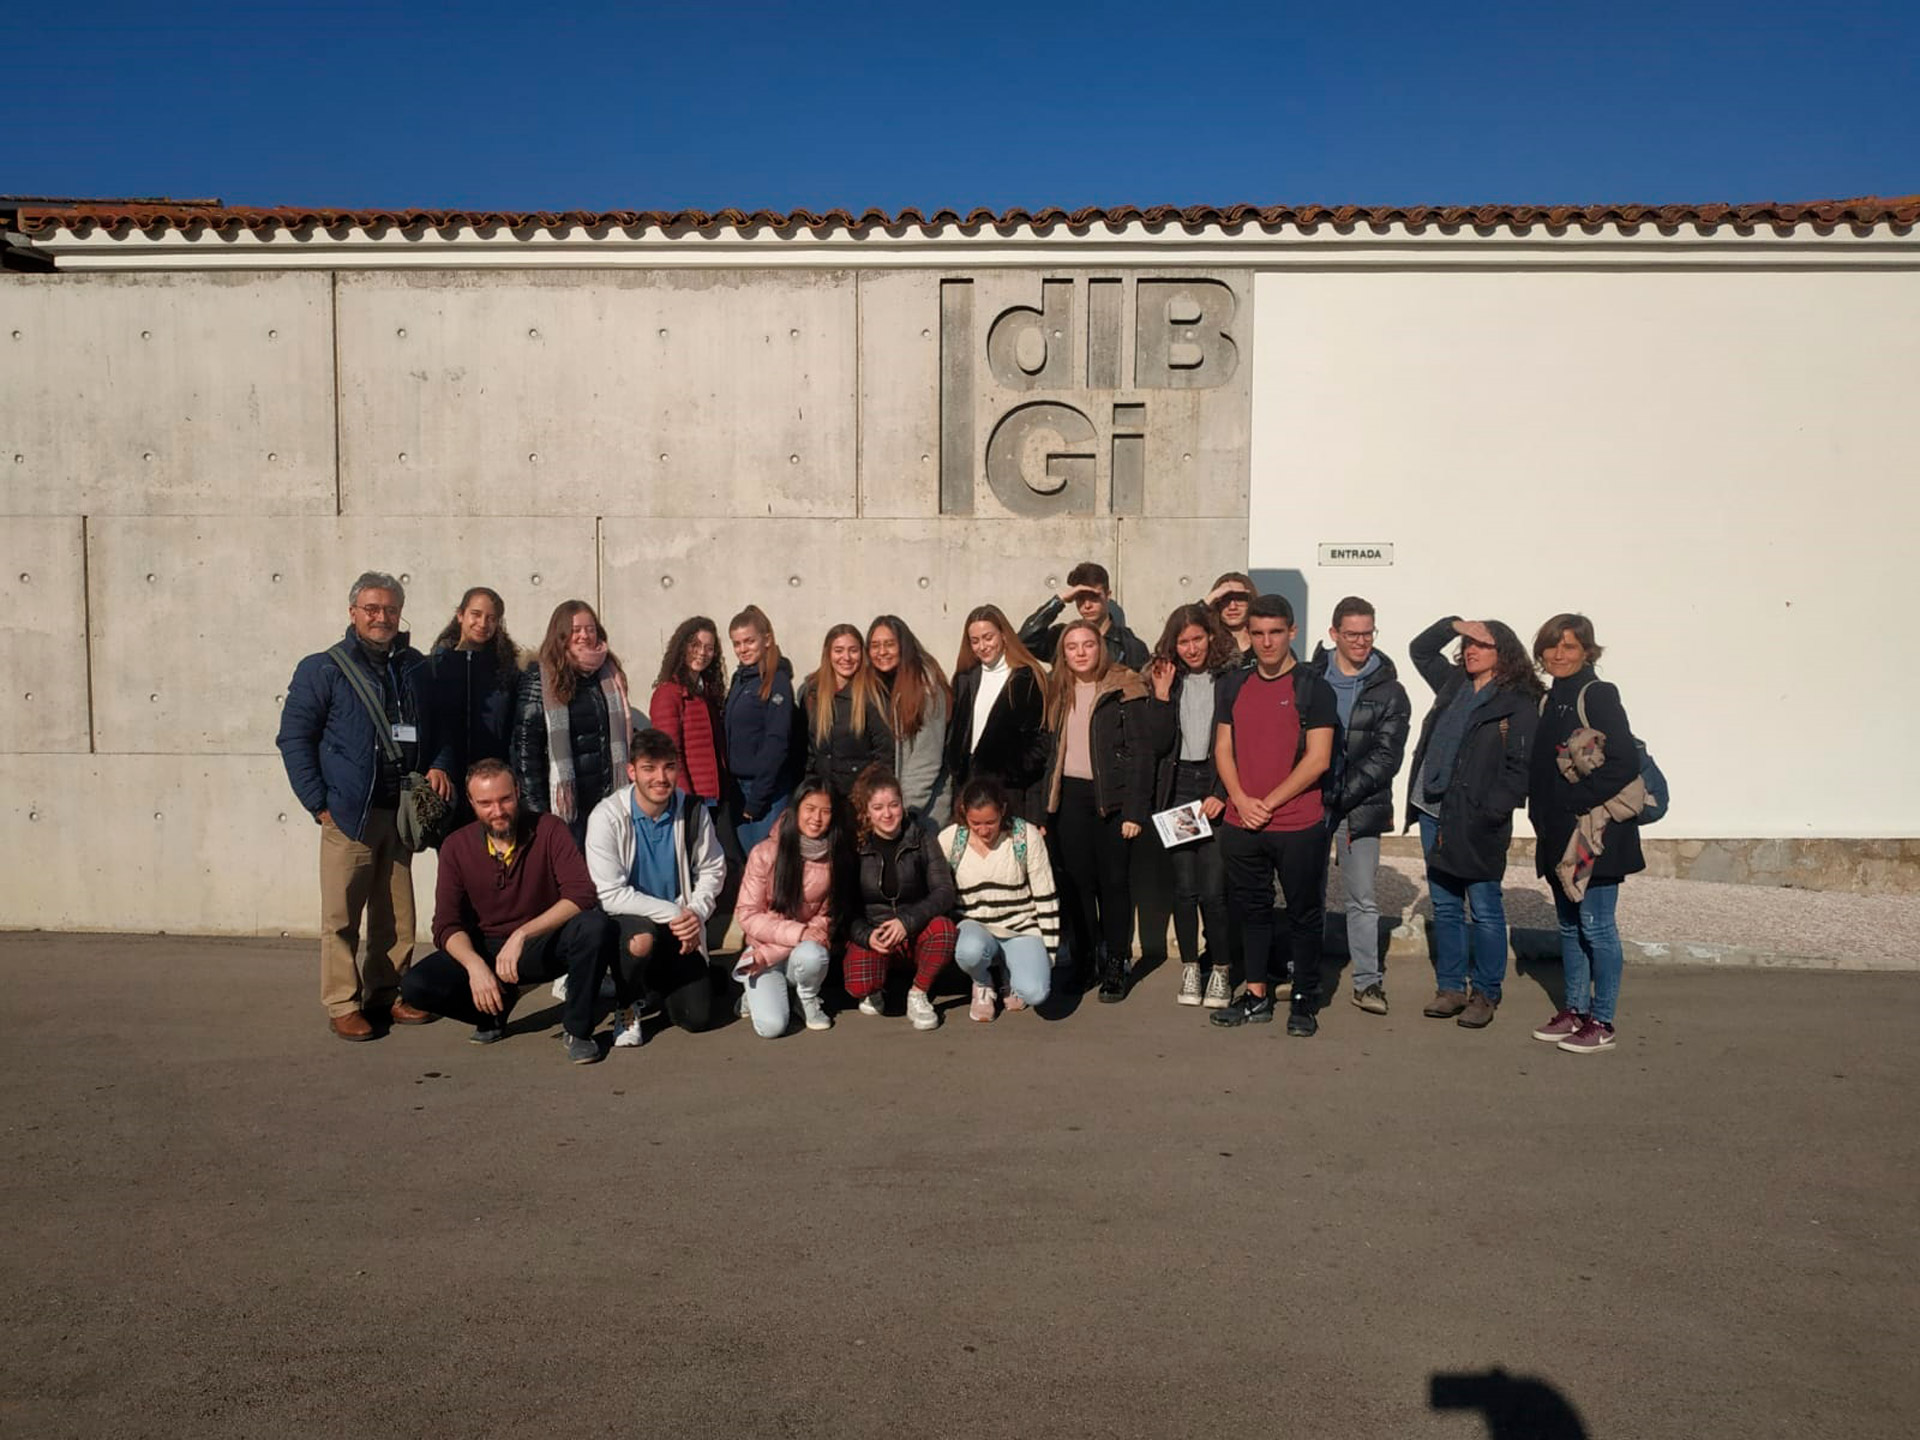 Visita d'estudiants de l'Institut Ramon Muntaner | 2020